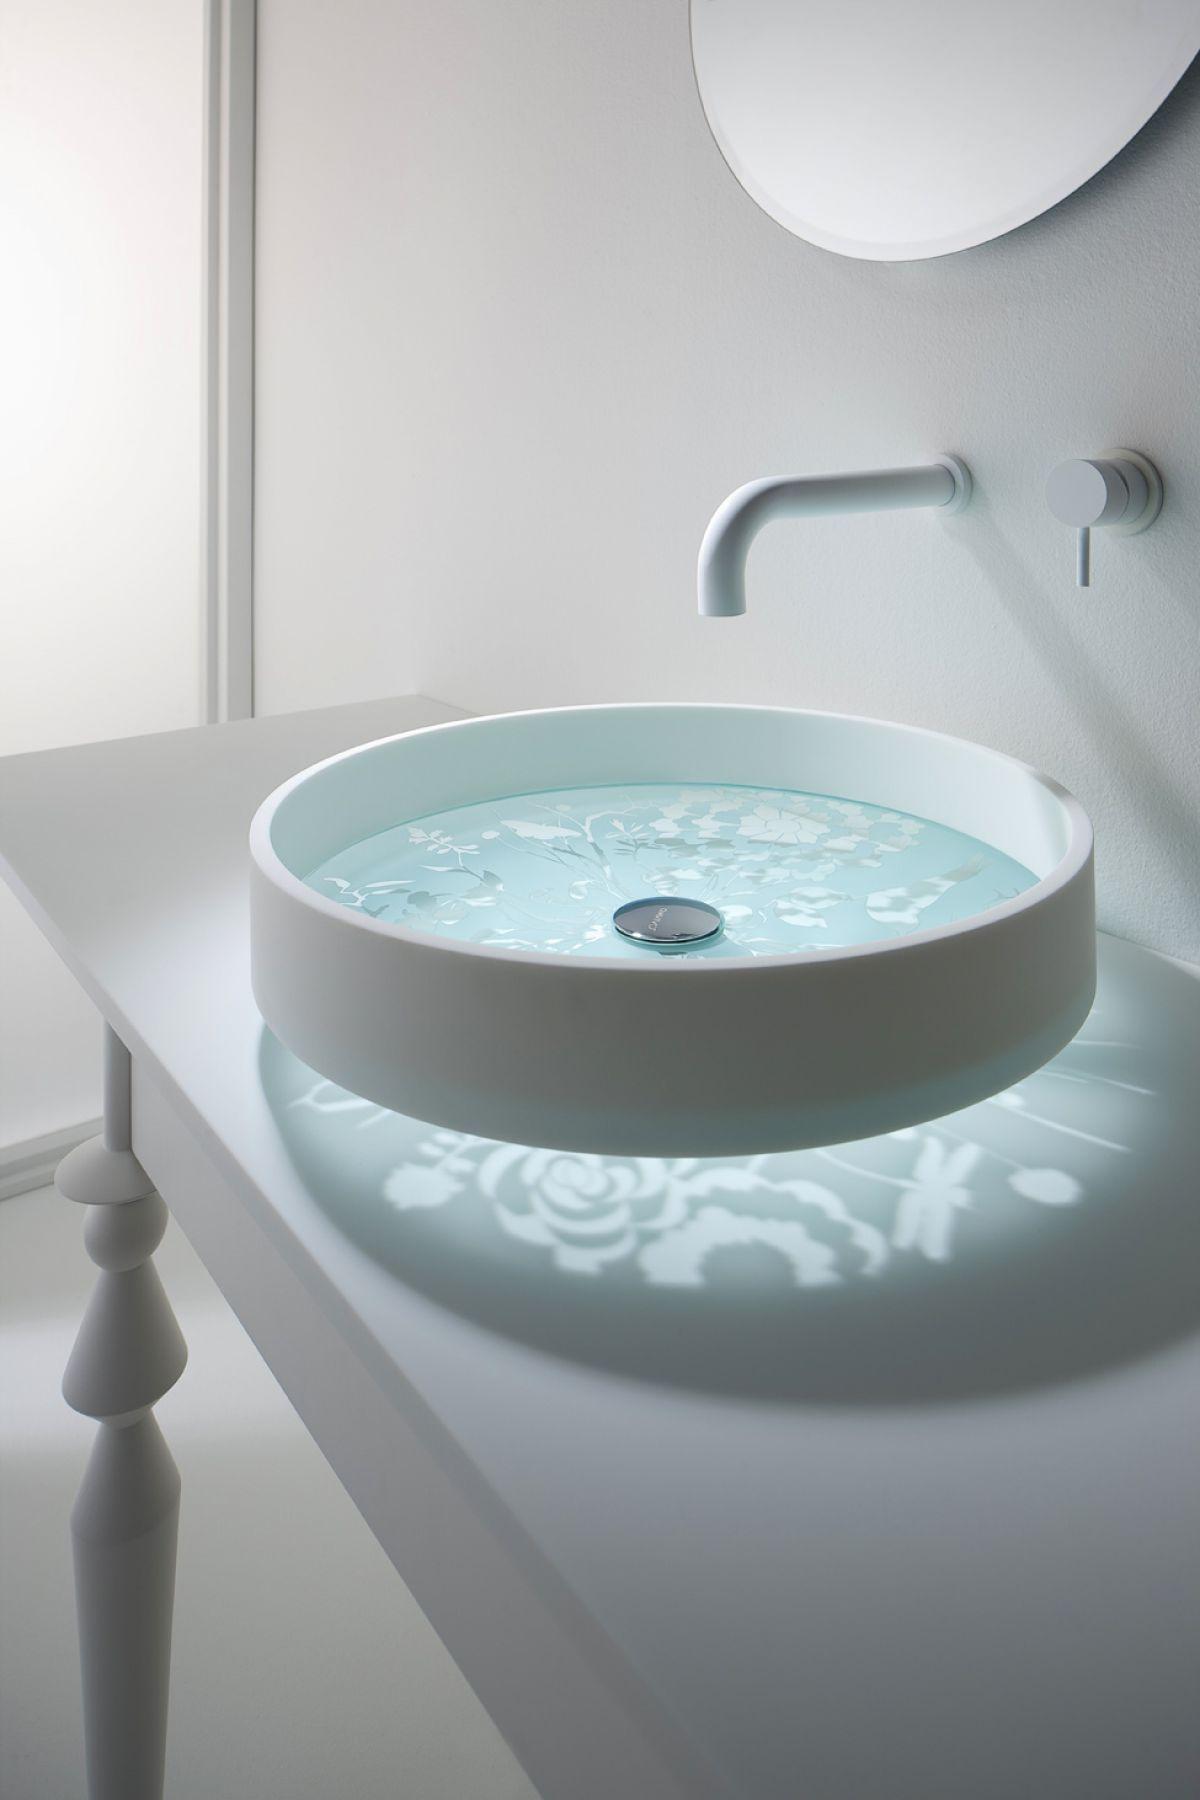 The Motif Basin Makes Your Bathroom Sink A Work Of Art Badkamer Inspiratie Badkamerideeen Badkamer